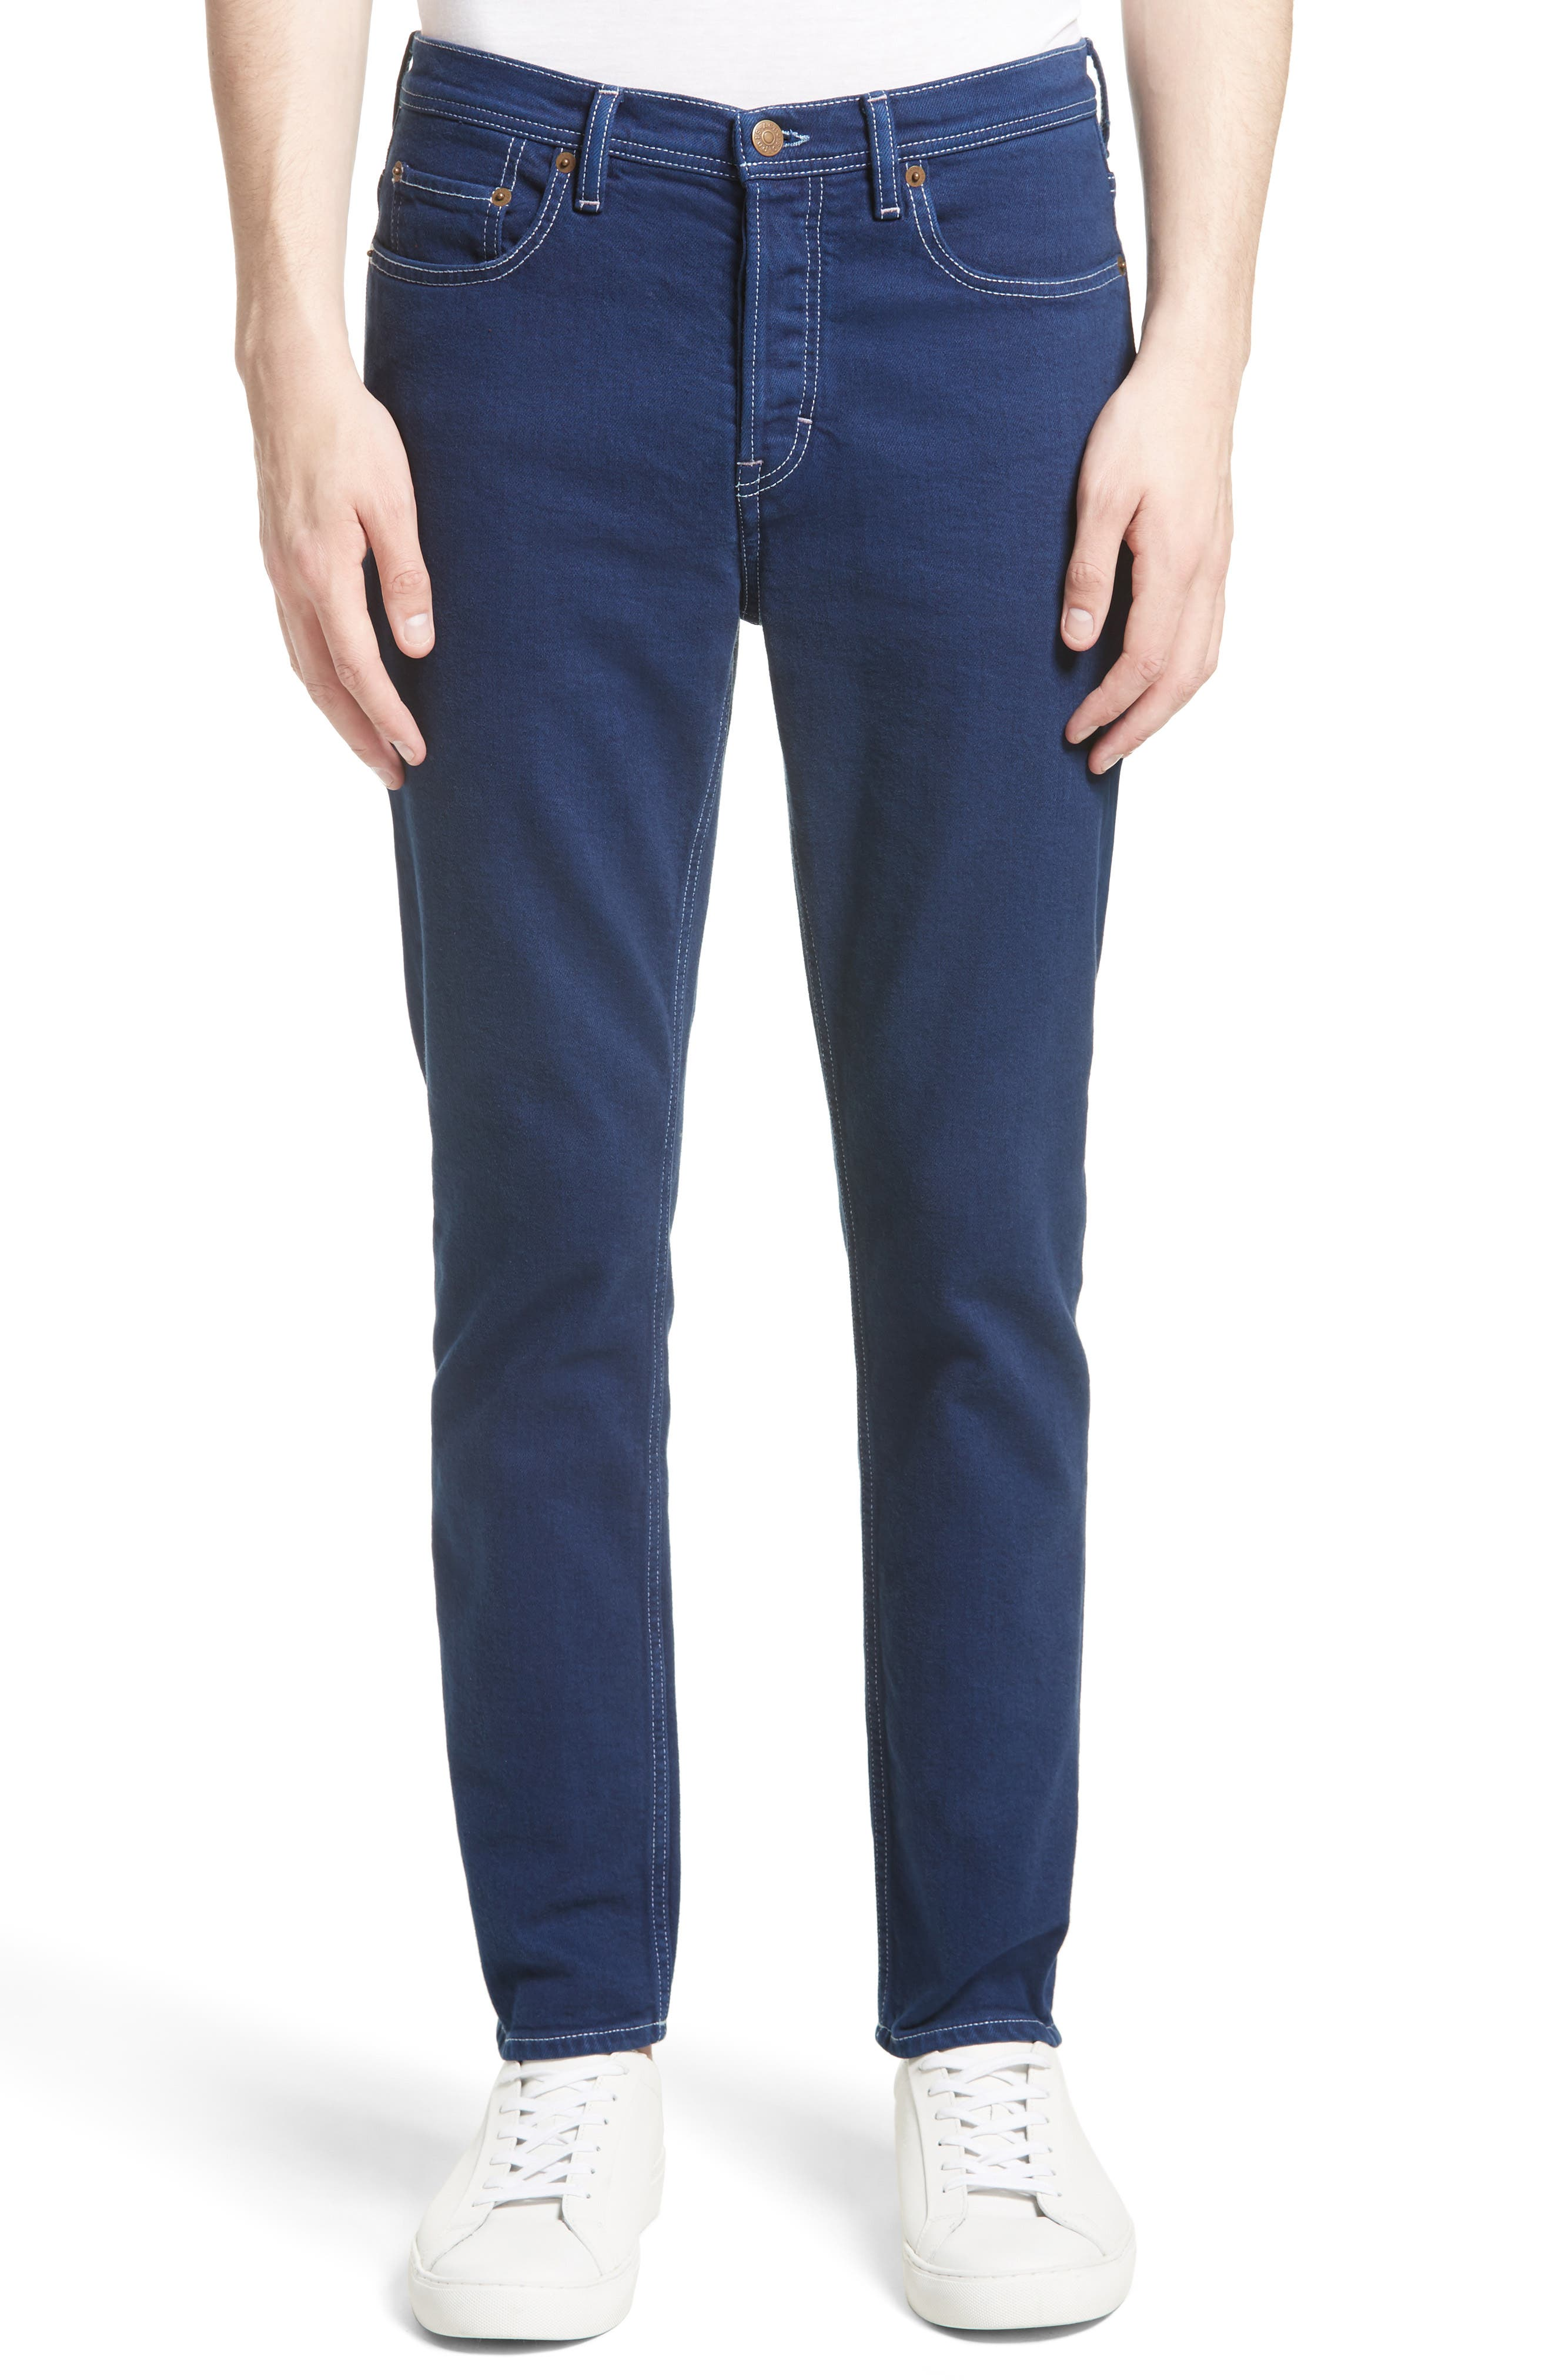 Main Image - ACNE Studios River Slim Tapered Fit Jeans (Cobalt)